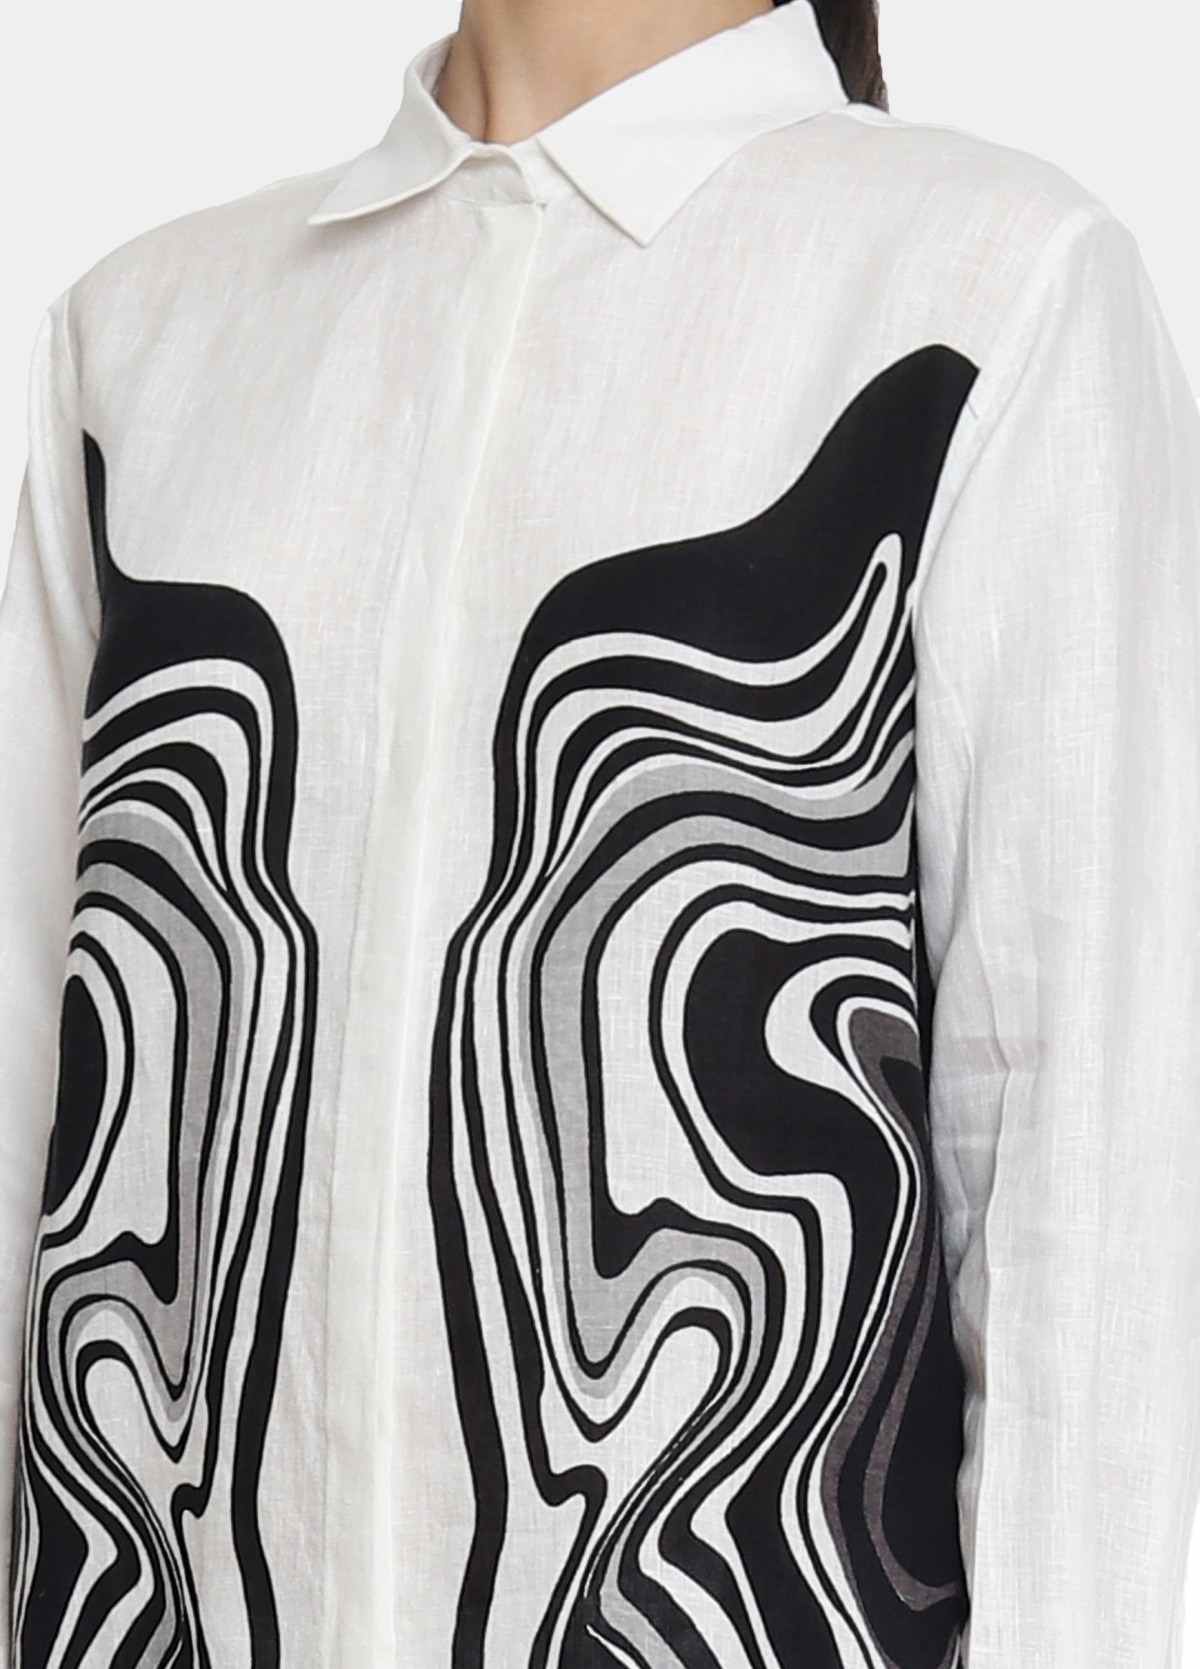 The Rave Shirt